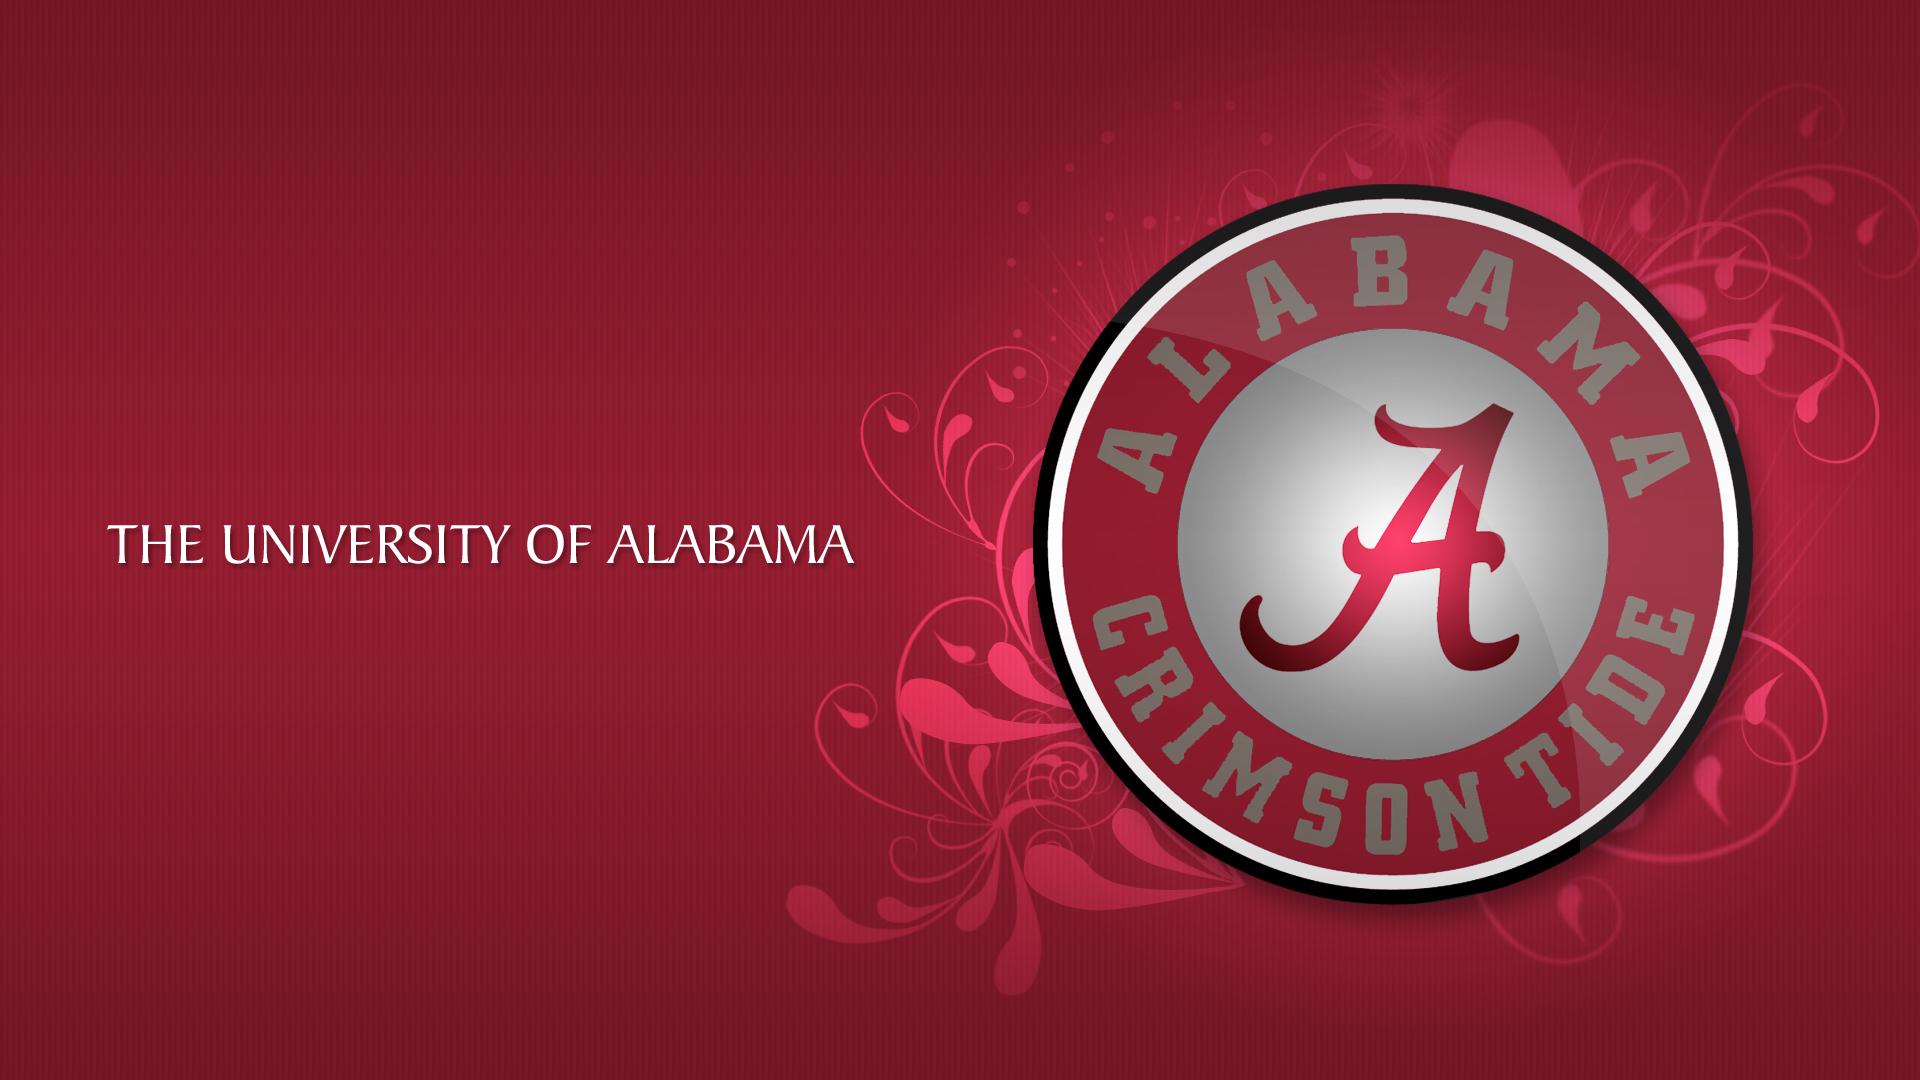 The University of Alabama USA   Wallpaper 34946 1920x1080